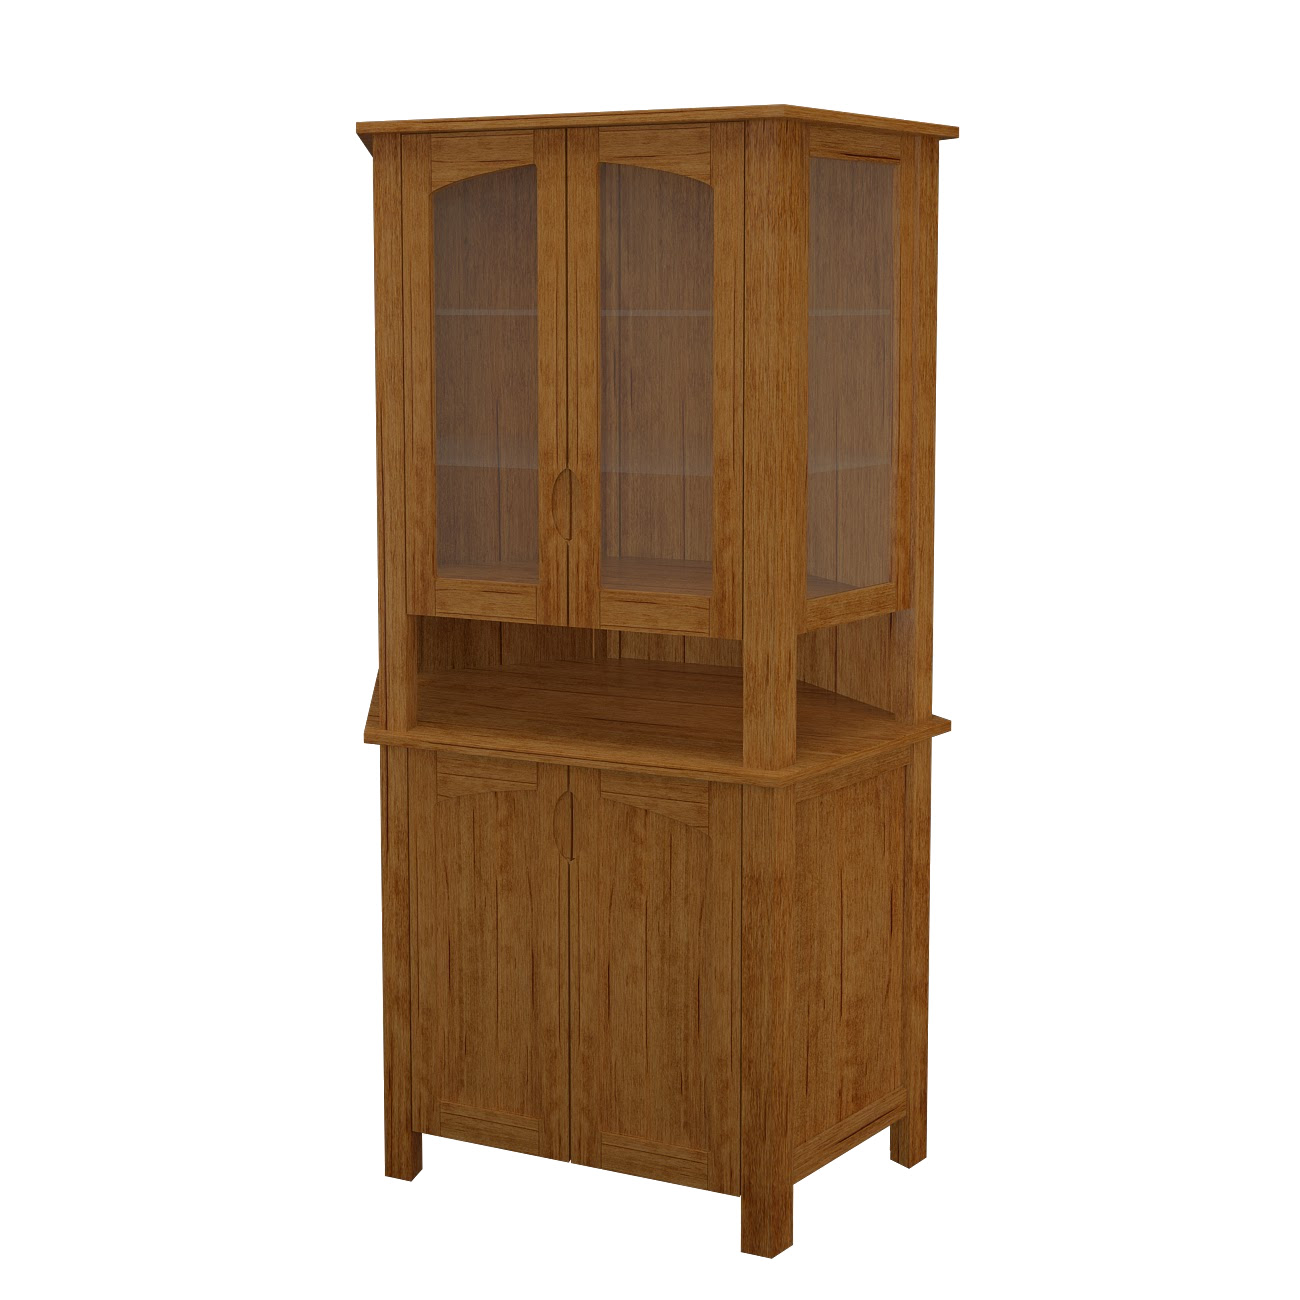 Luxor Kitchen Cabinets: Solid Wood Corner Cabinet